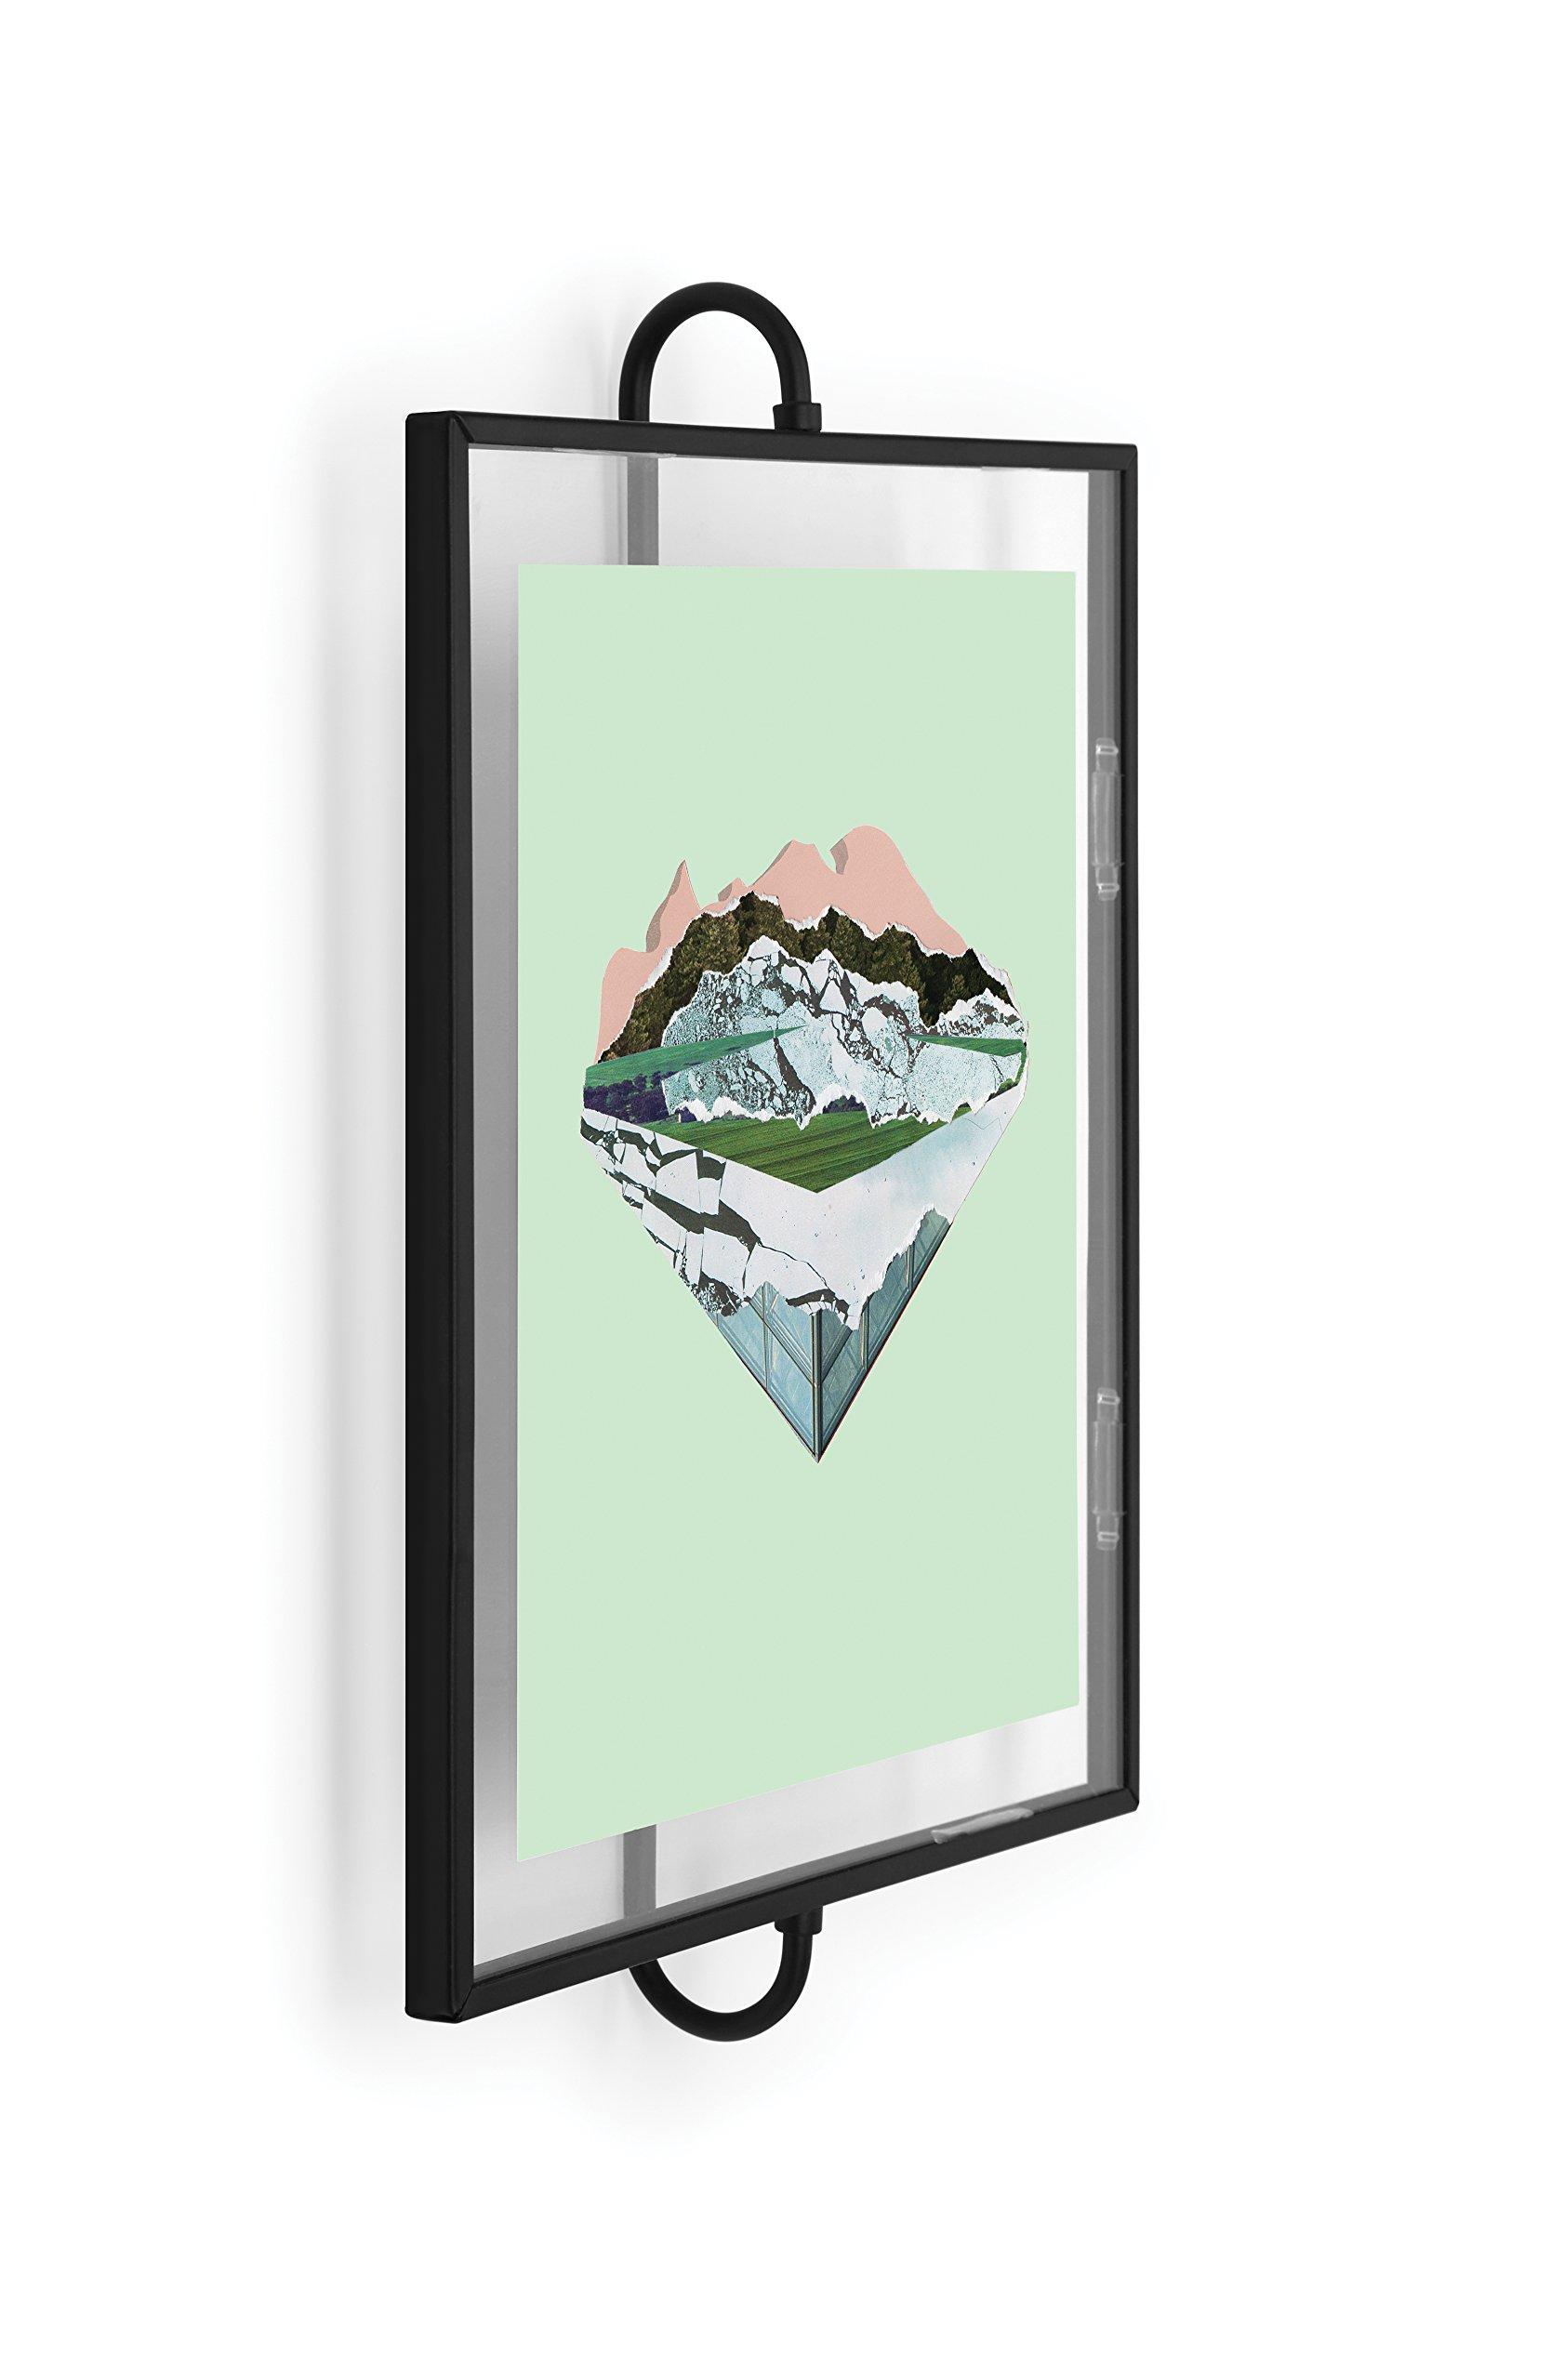 Umbra Phantom Wall Picture Frame, 8 x 10, Floating Frame, Black by Umbra